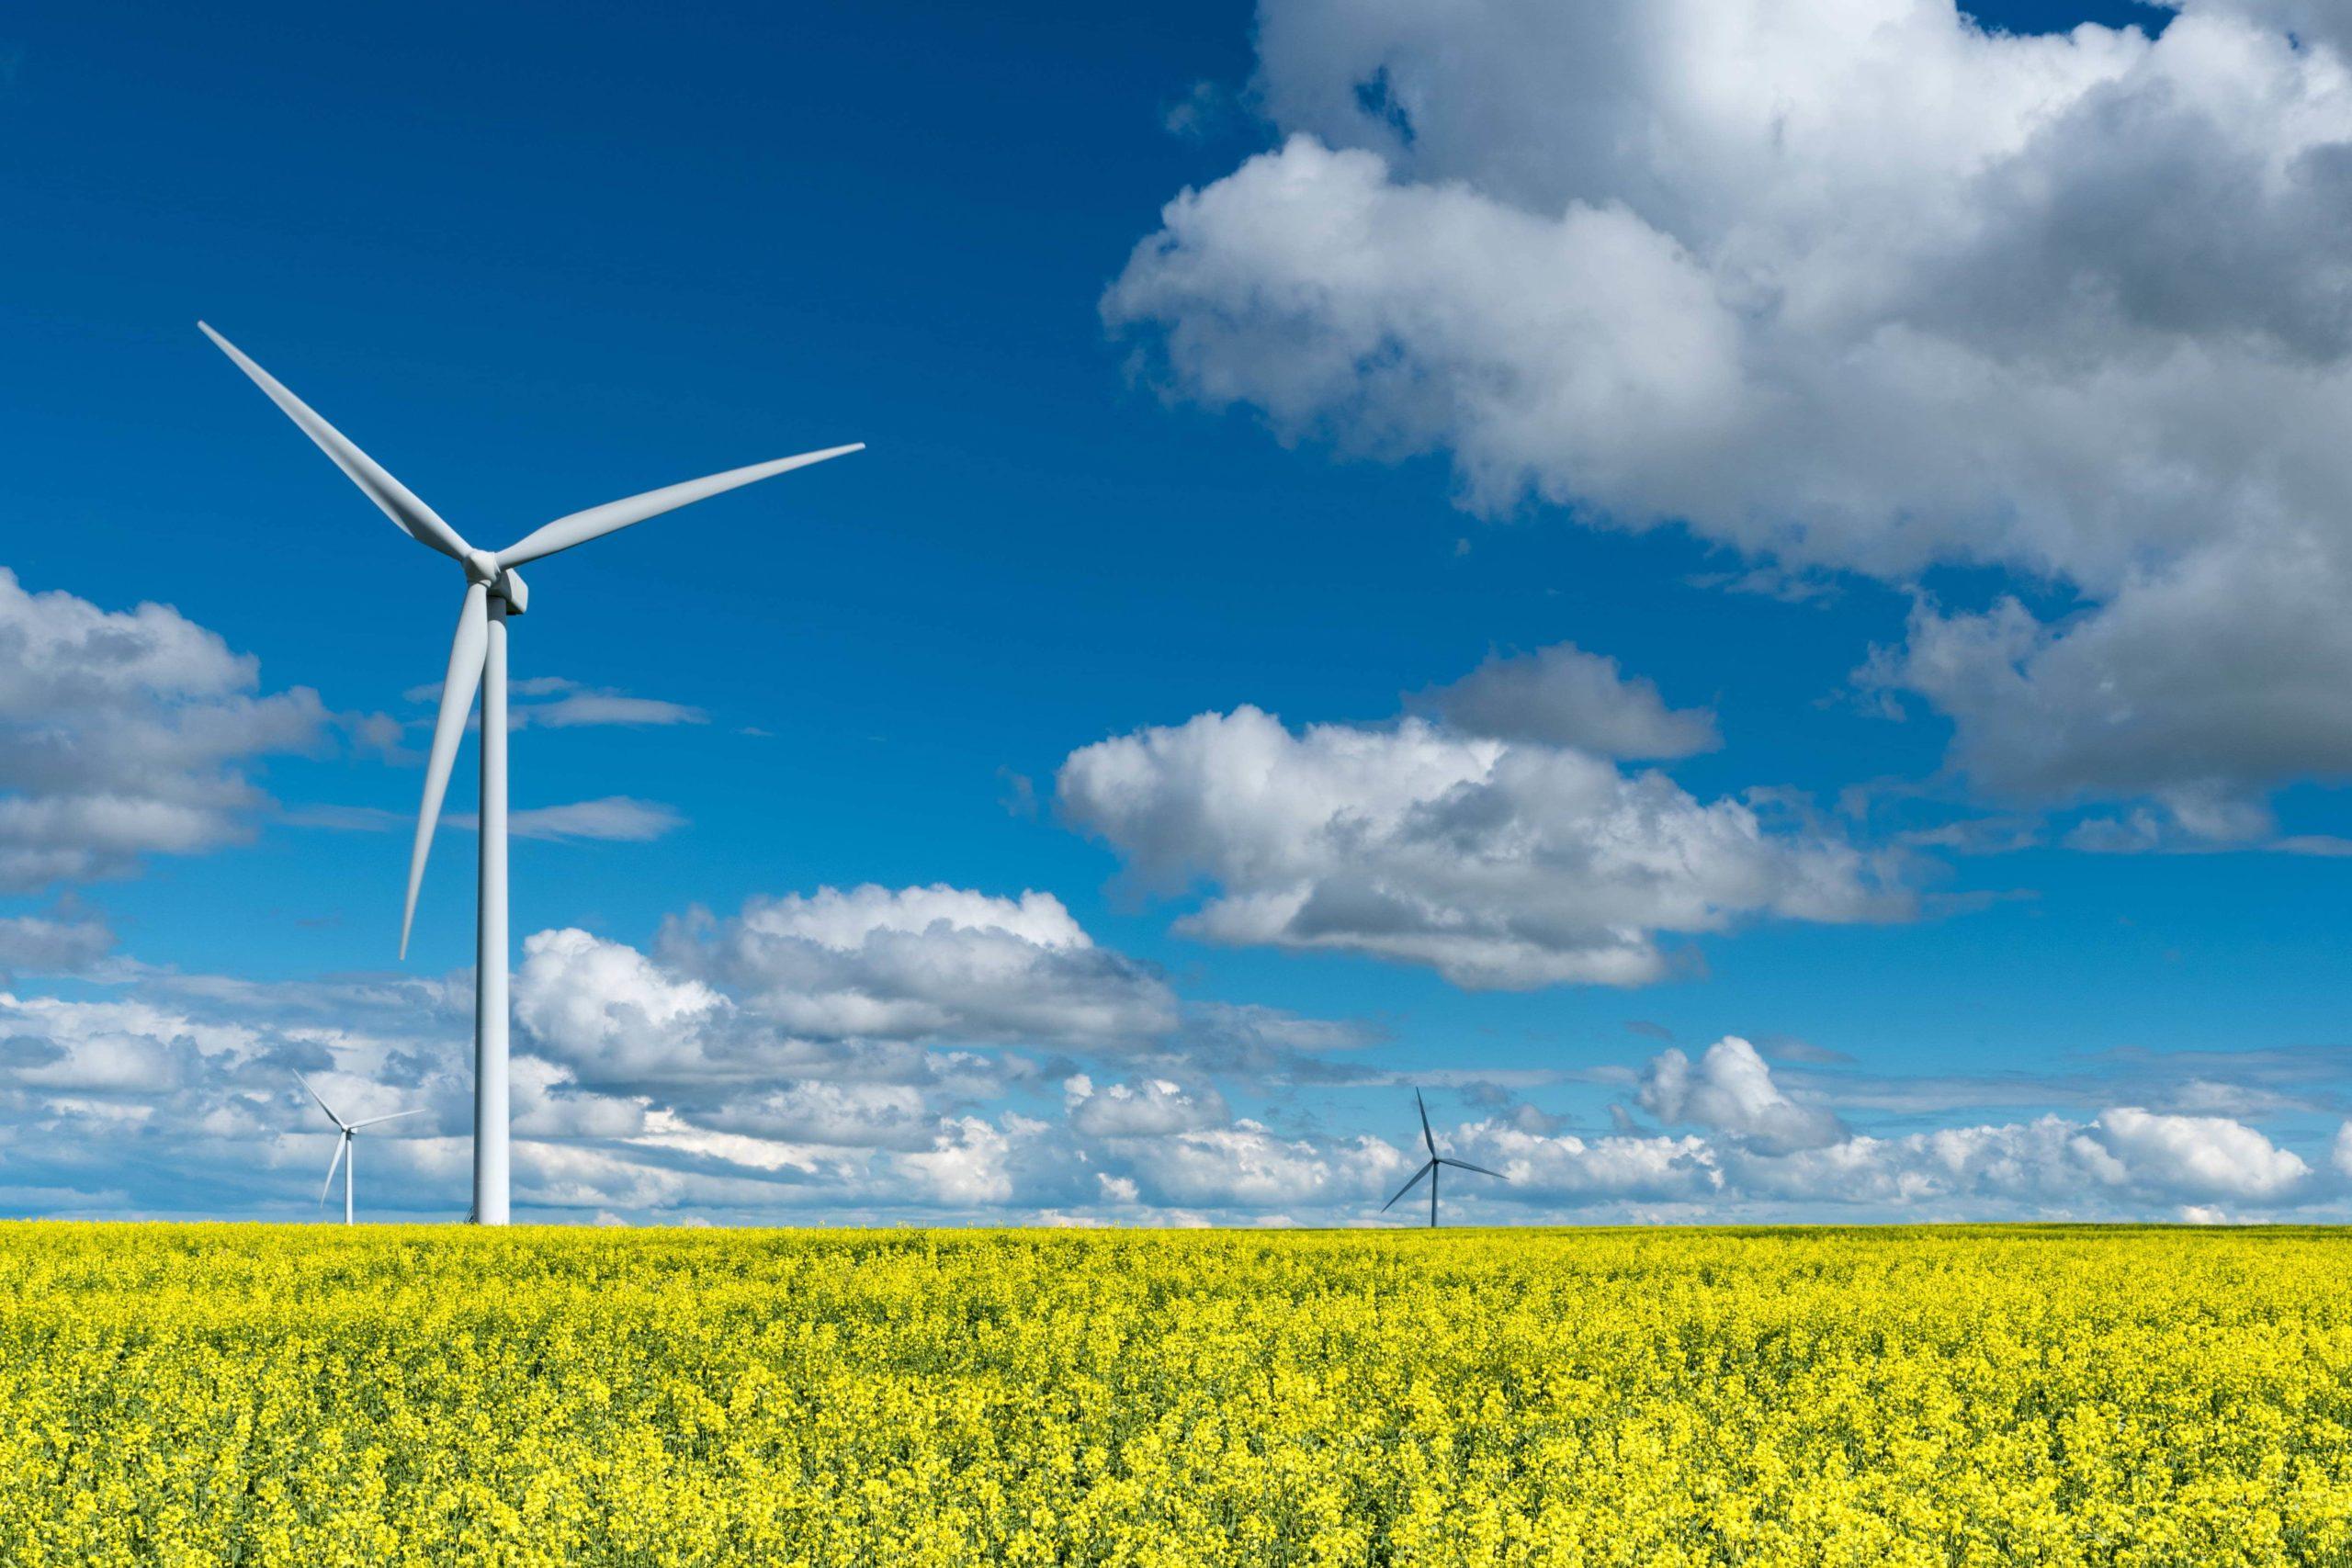 Image of windmill in field.